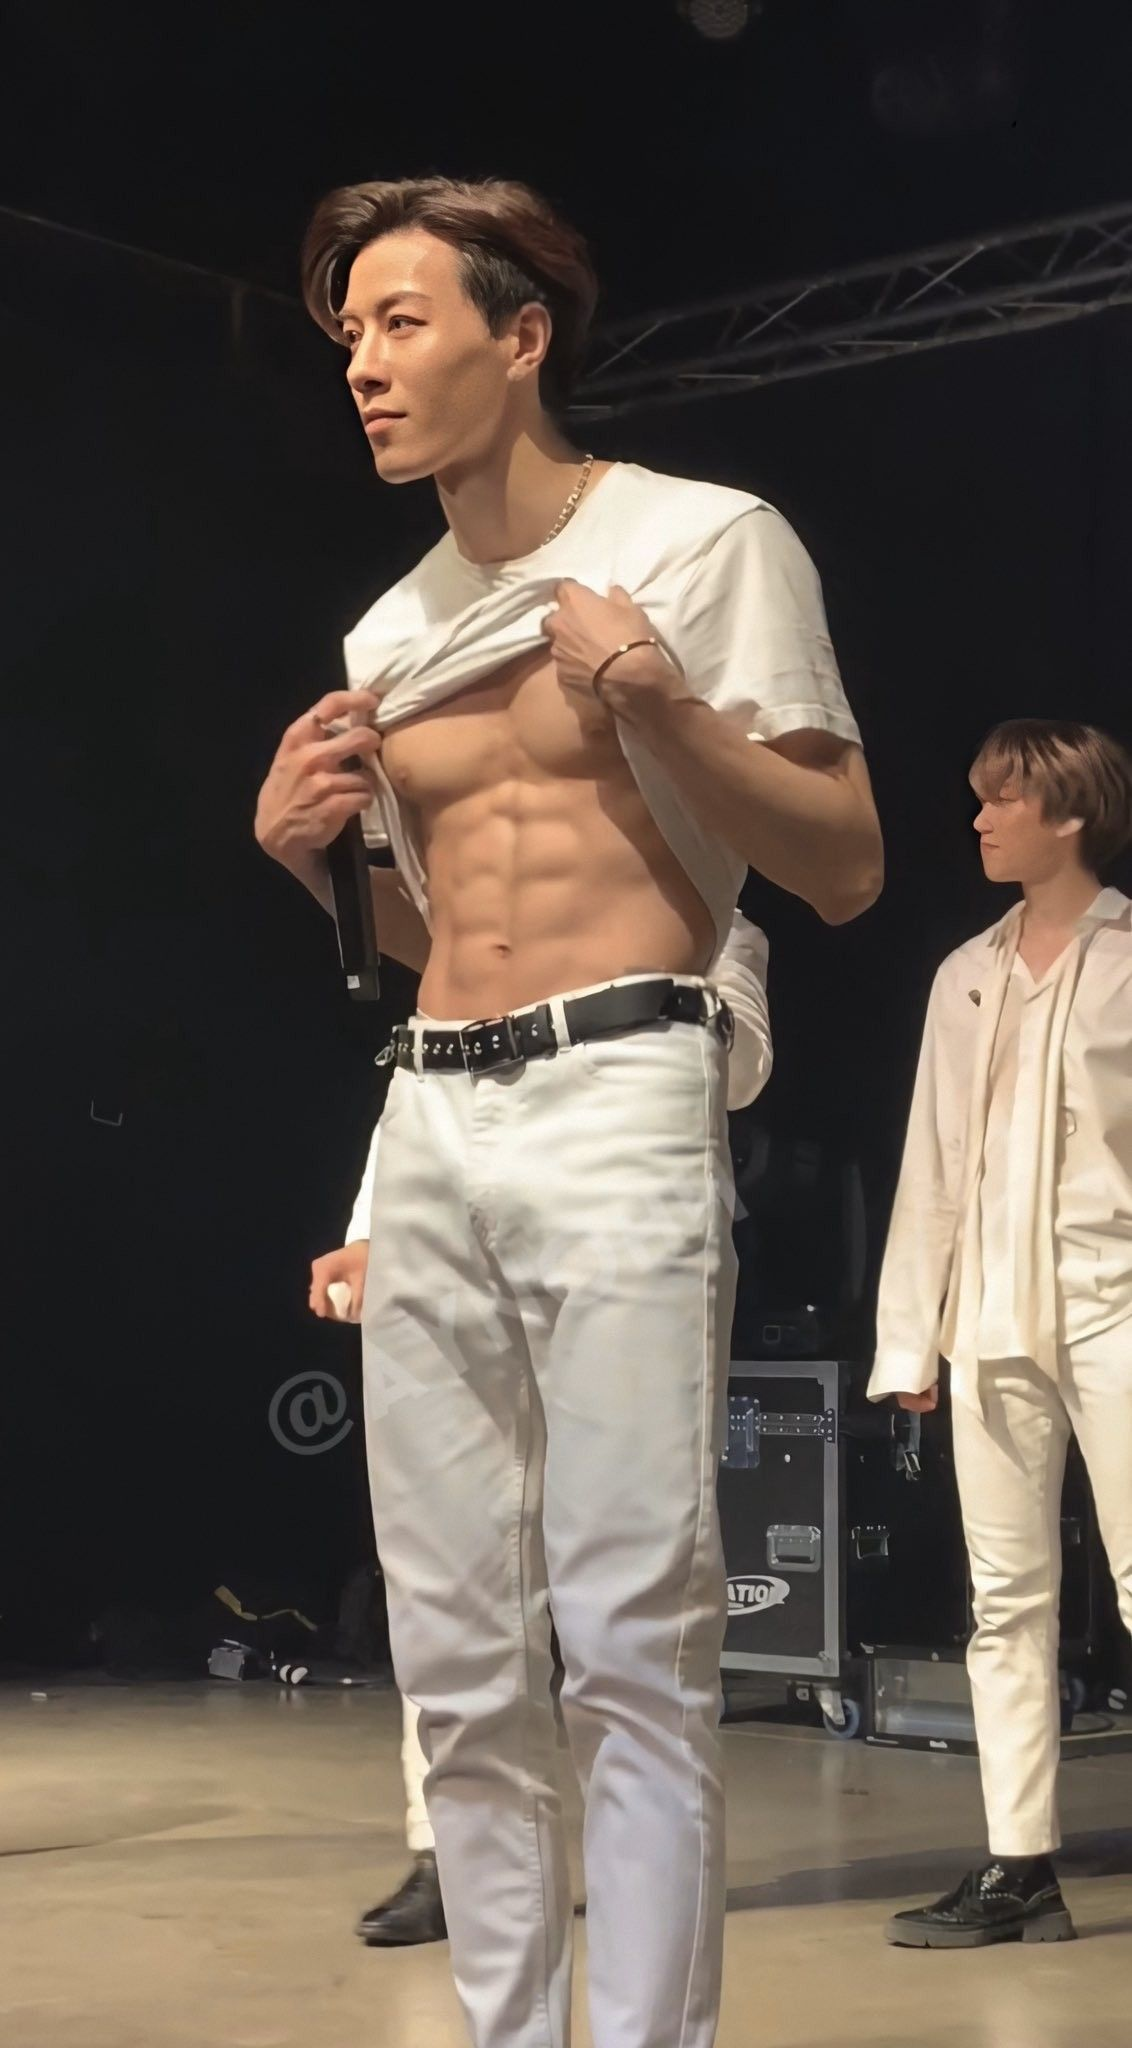 Pin By Alex On Vav Abs Boys Korean Male Models Korean Idol